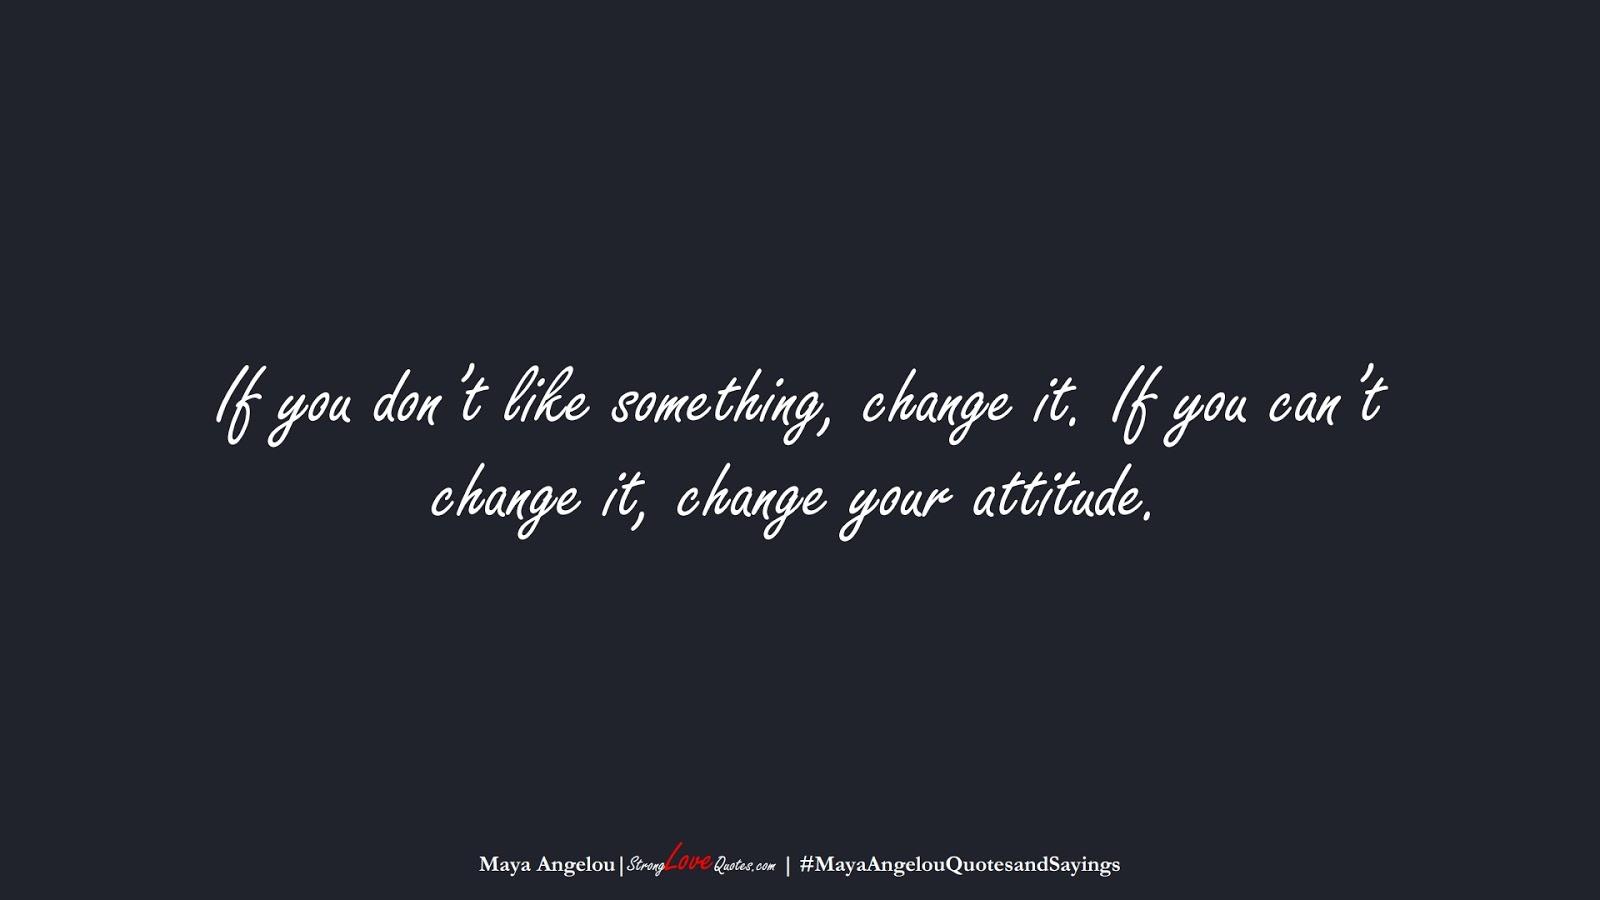 If you don't like something, change it. If you can't change it, change your attitude. (Maya Angelou);  #MayaAngelouQuotesandSayings